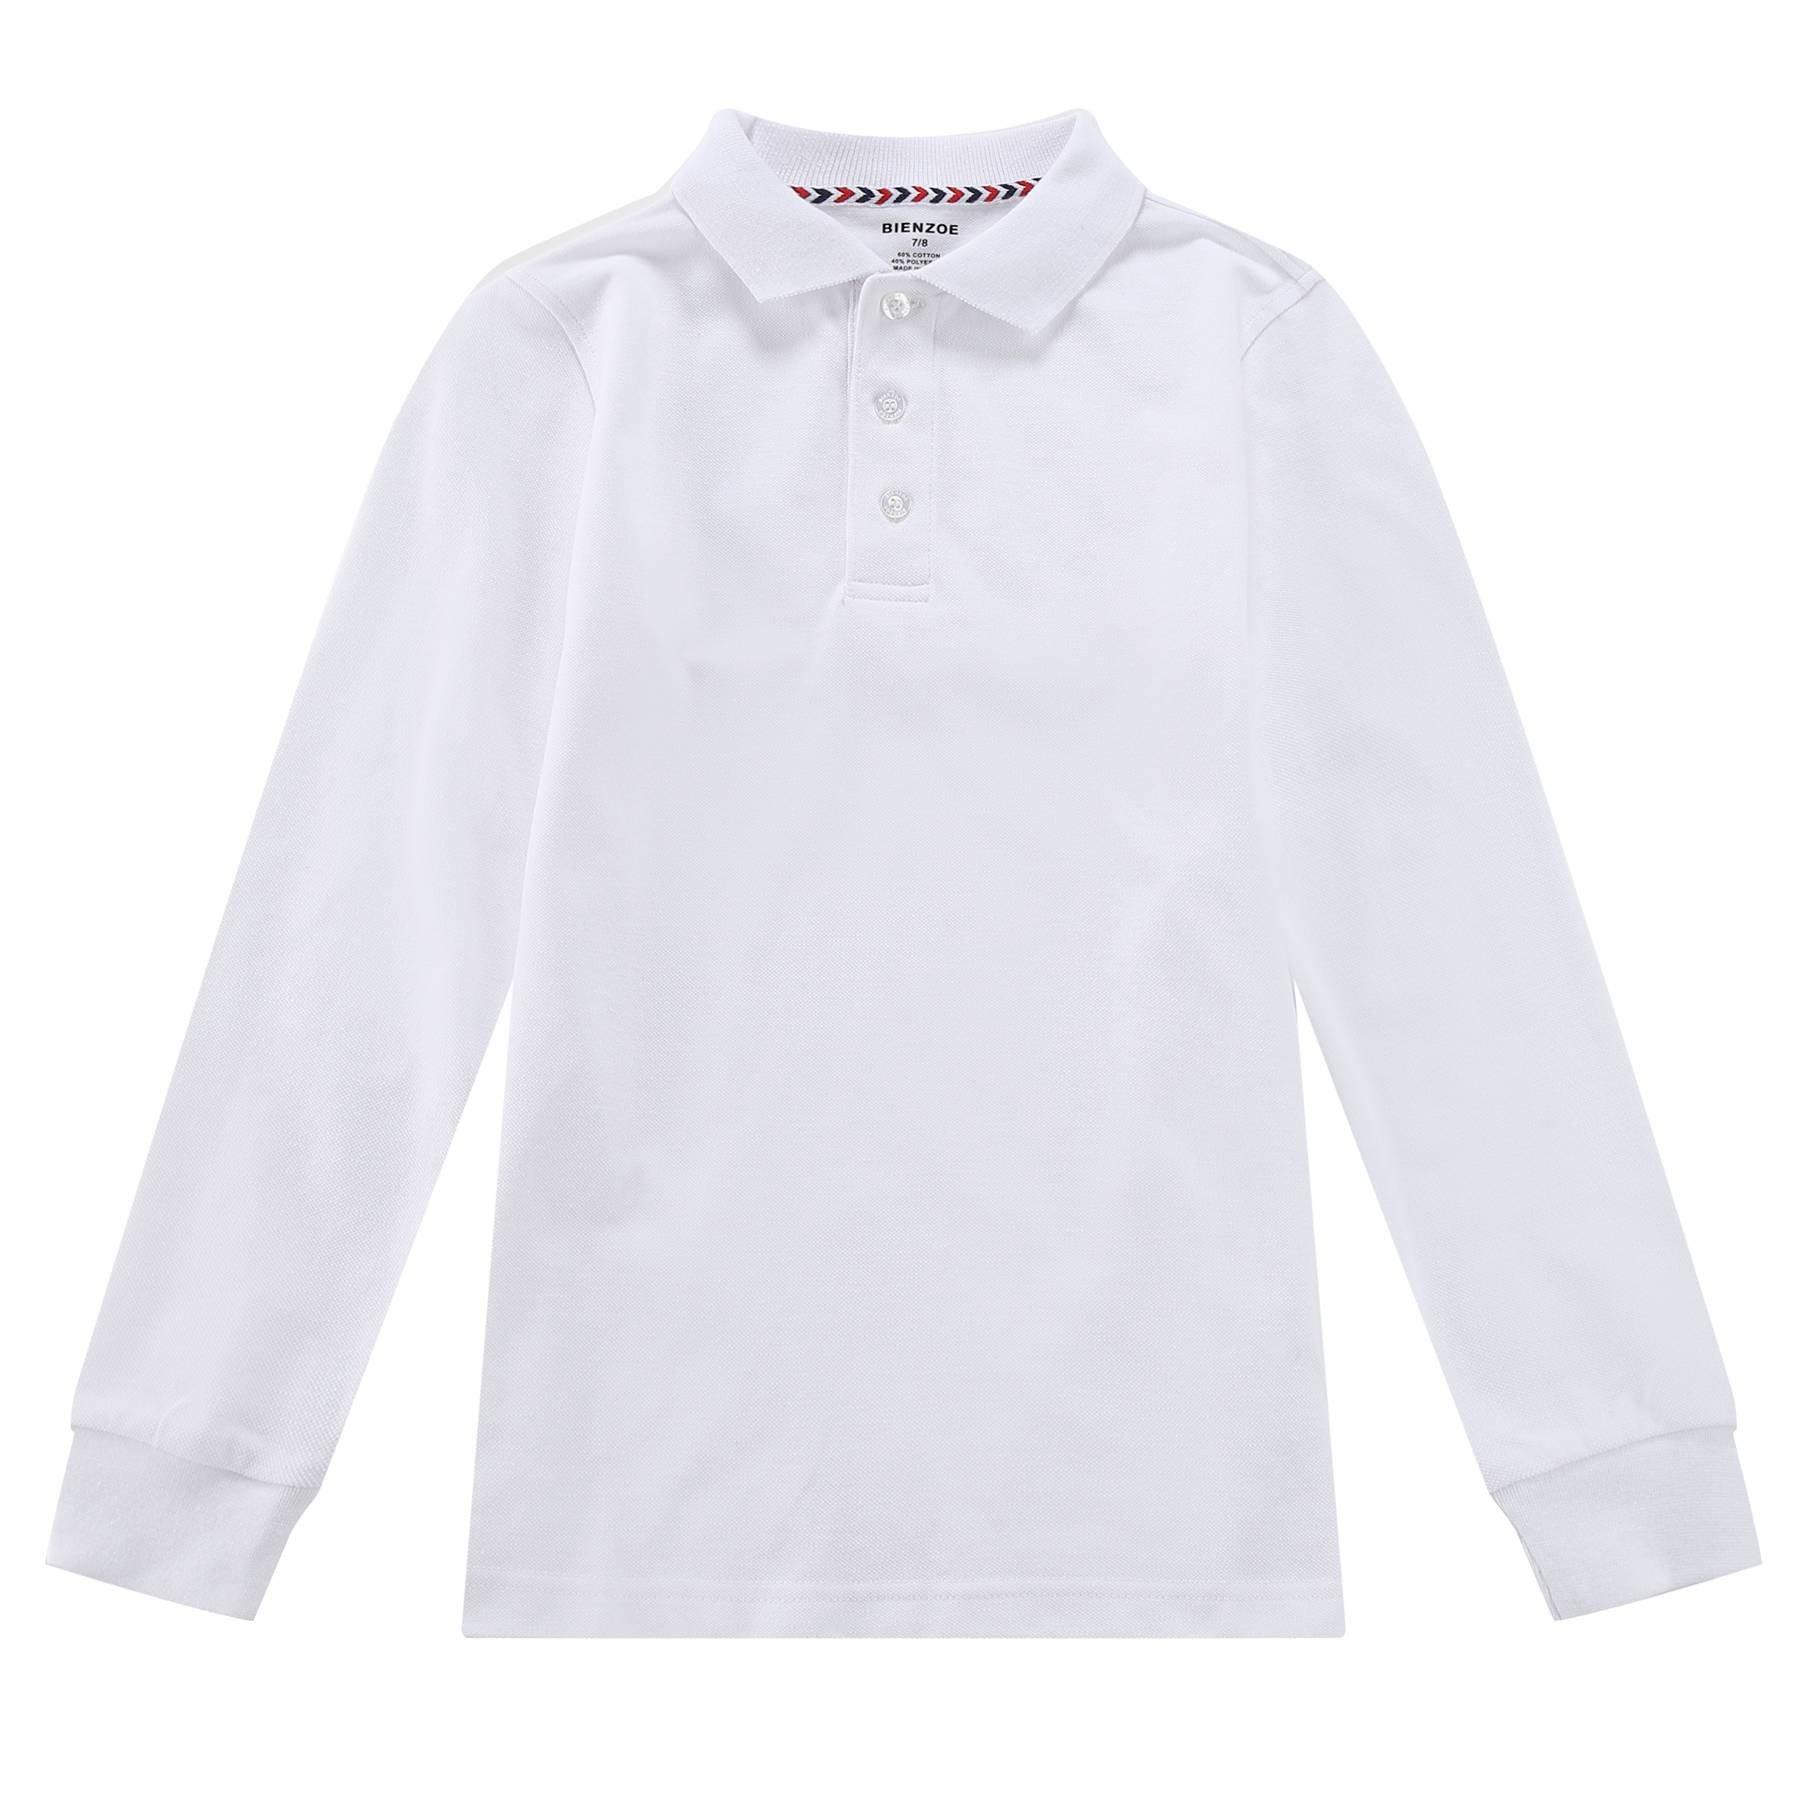 Bienzoe Boy's School Uniform Antimicrobial Breathable Quick Dry Long Sleeve Polo White 10/12